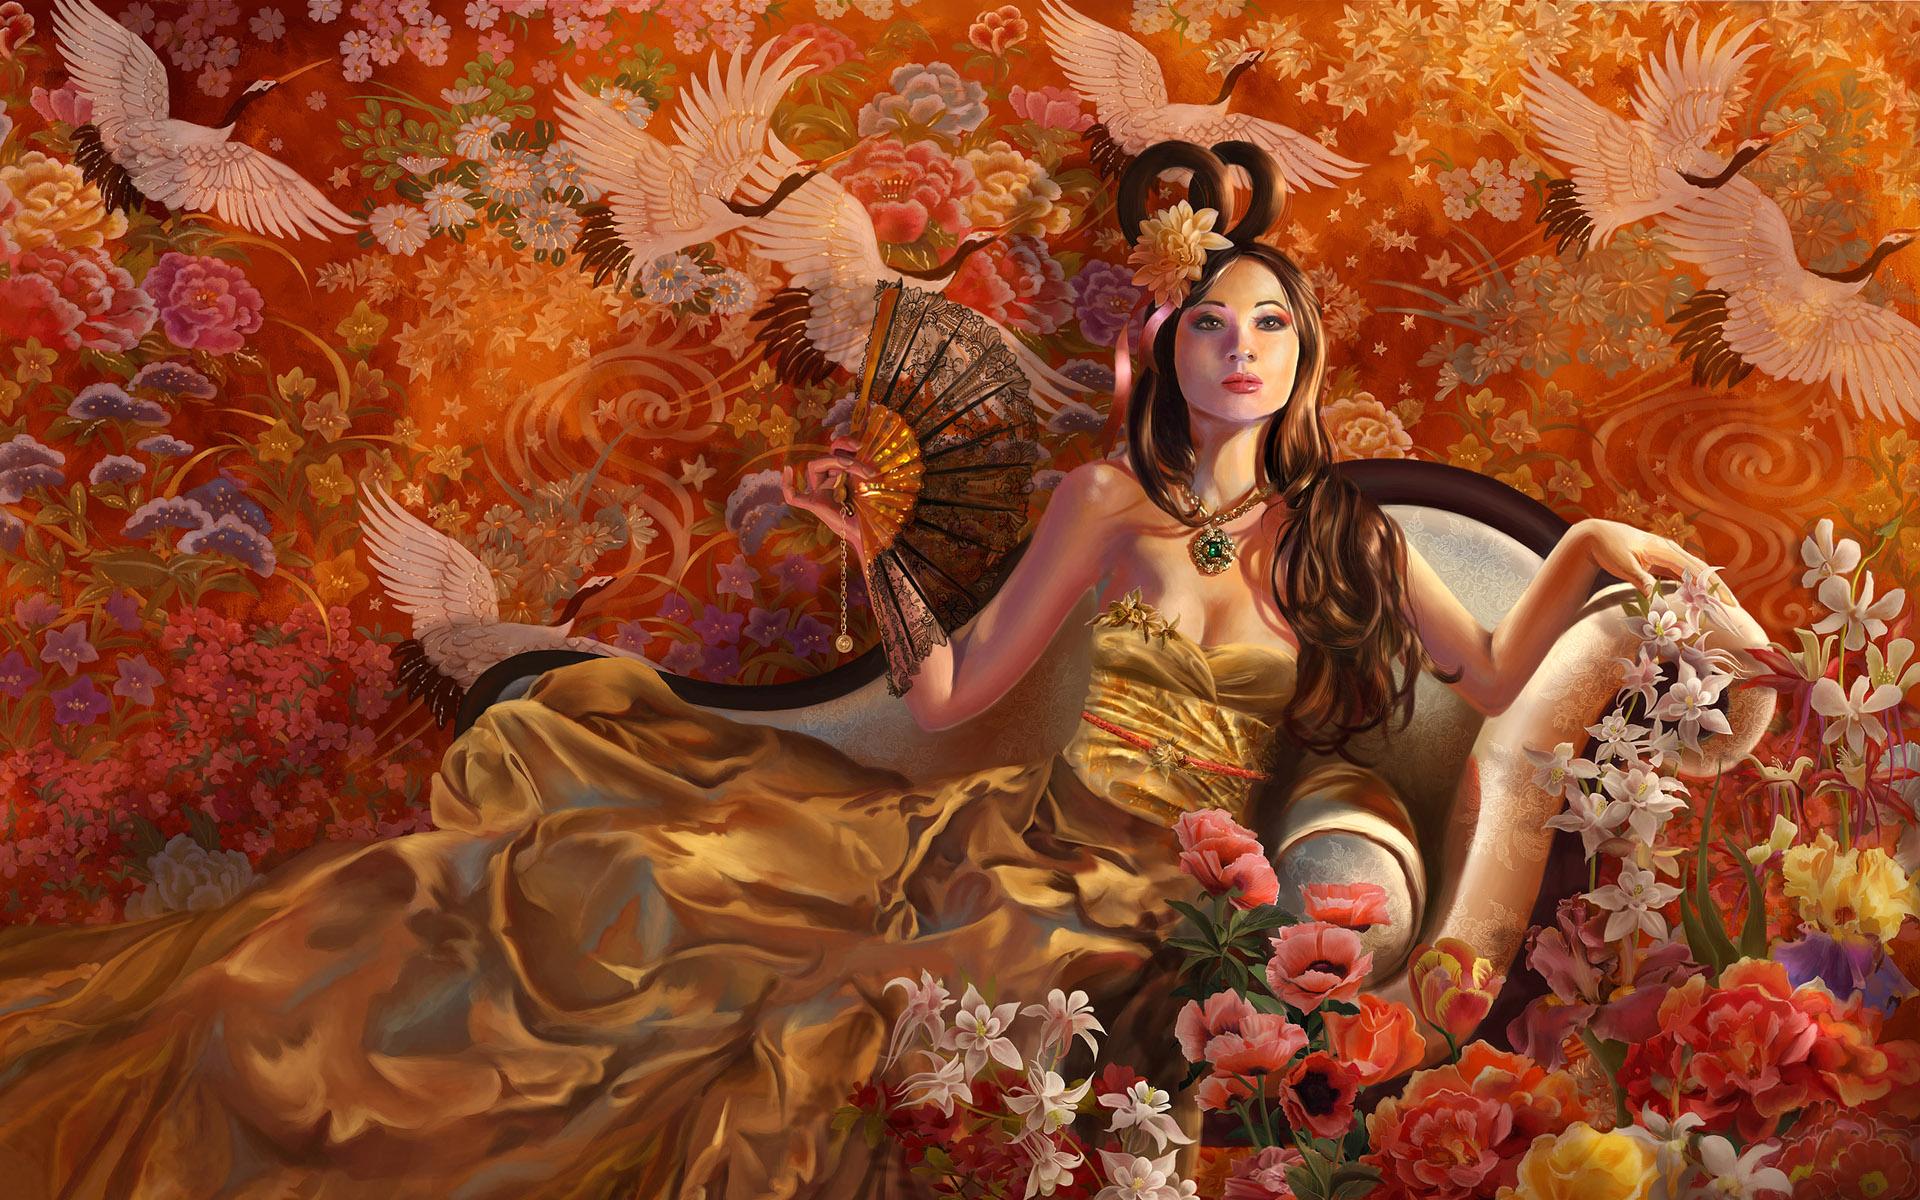 Fantasy women desktop wallpaper 11873 1920x1200 px hdwallsource fantasy women desktop wallpaper 11873 voltagebd Images